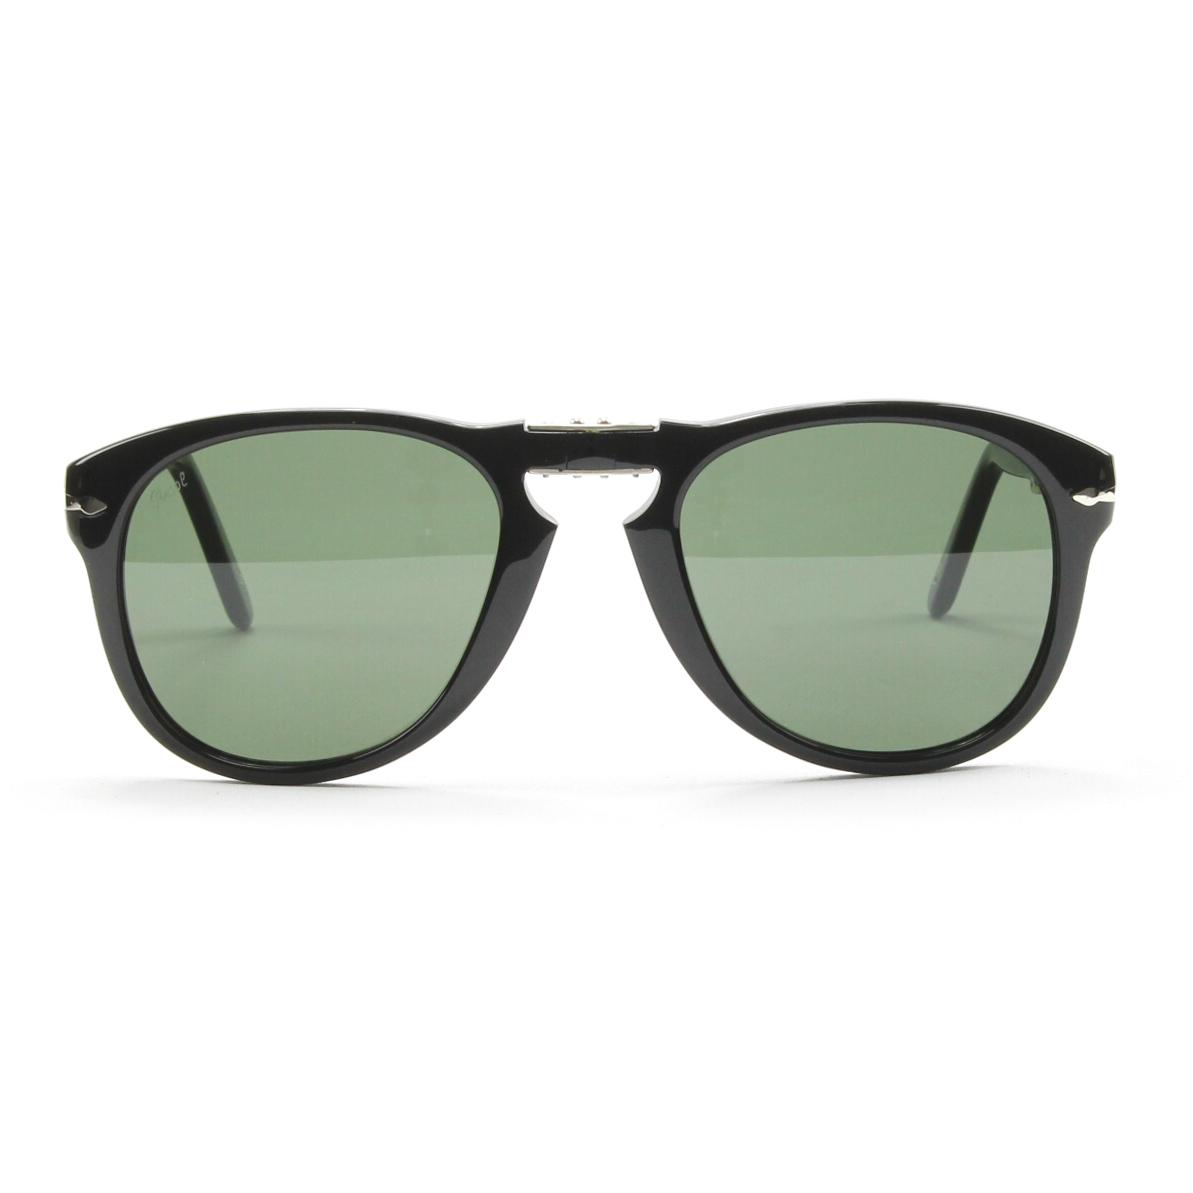 Persol 714 Folding Sunglasses 95/31 Black, Grey Crystal Lens PO0714 54mm NEW | eBay